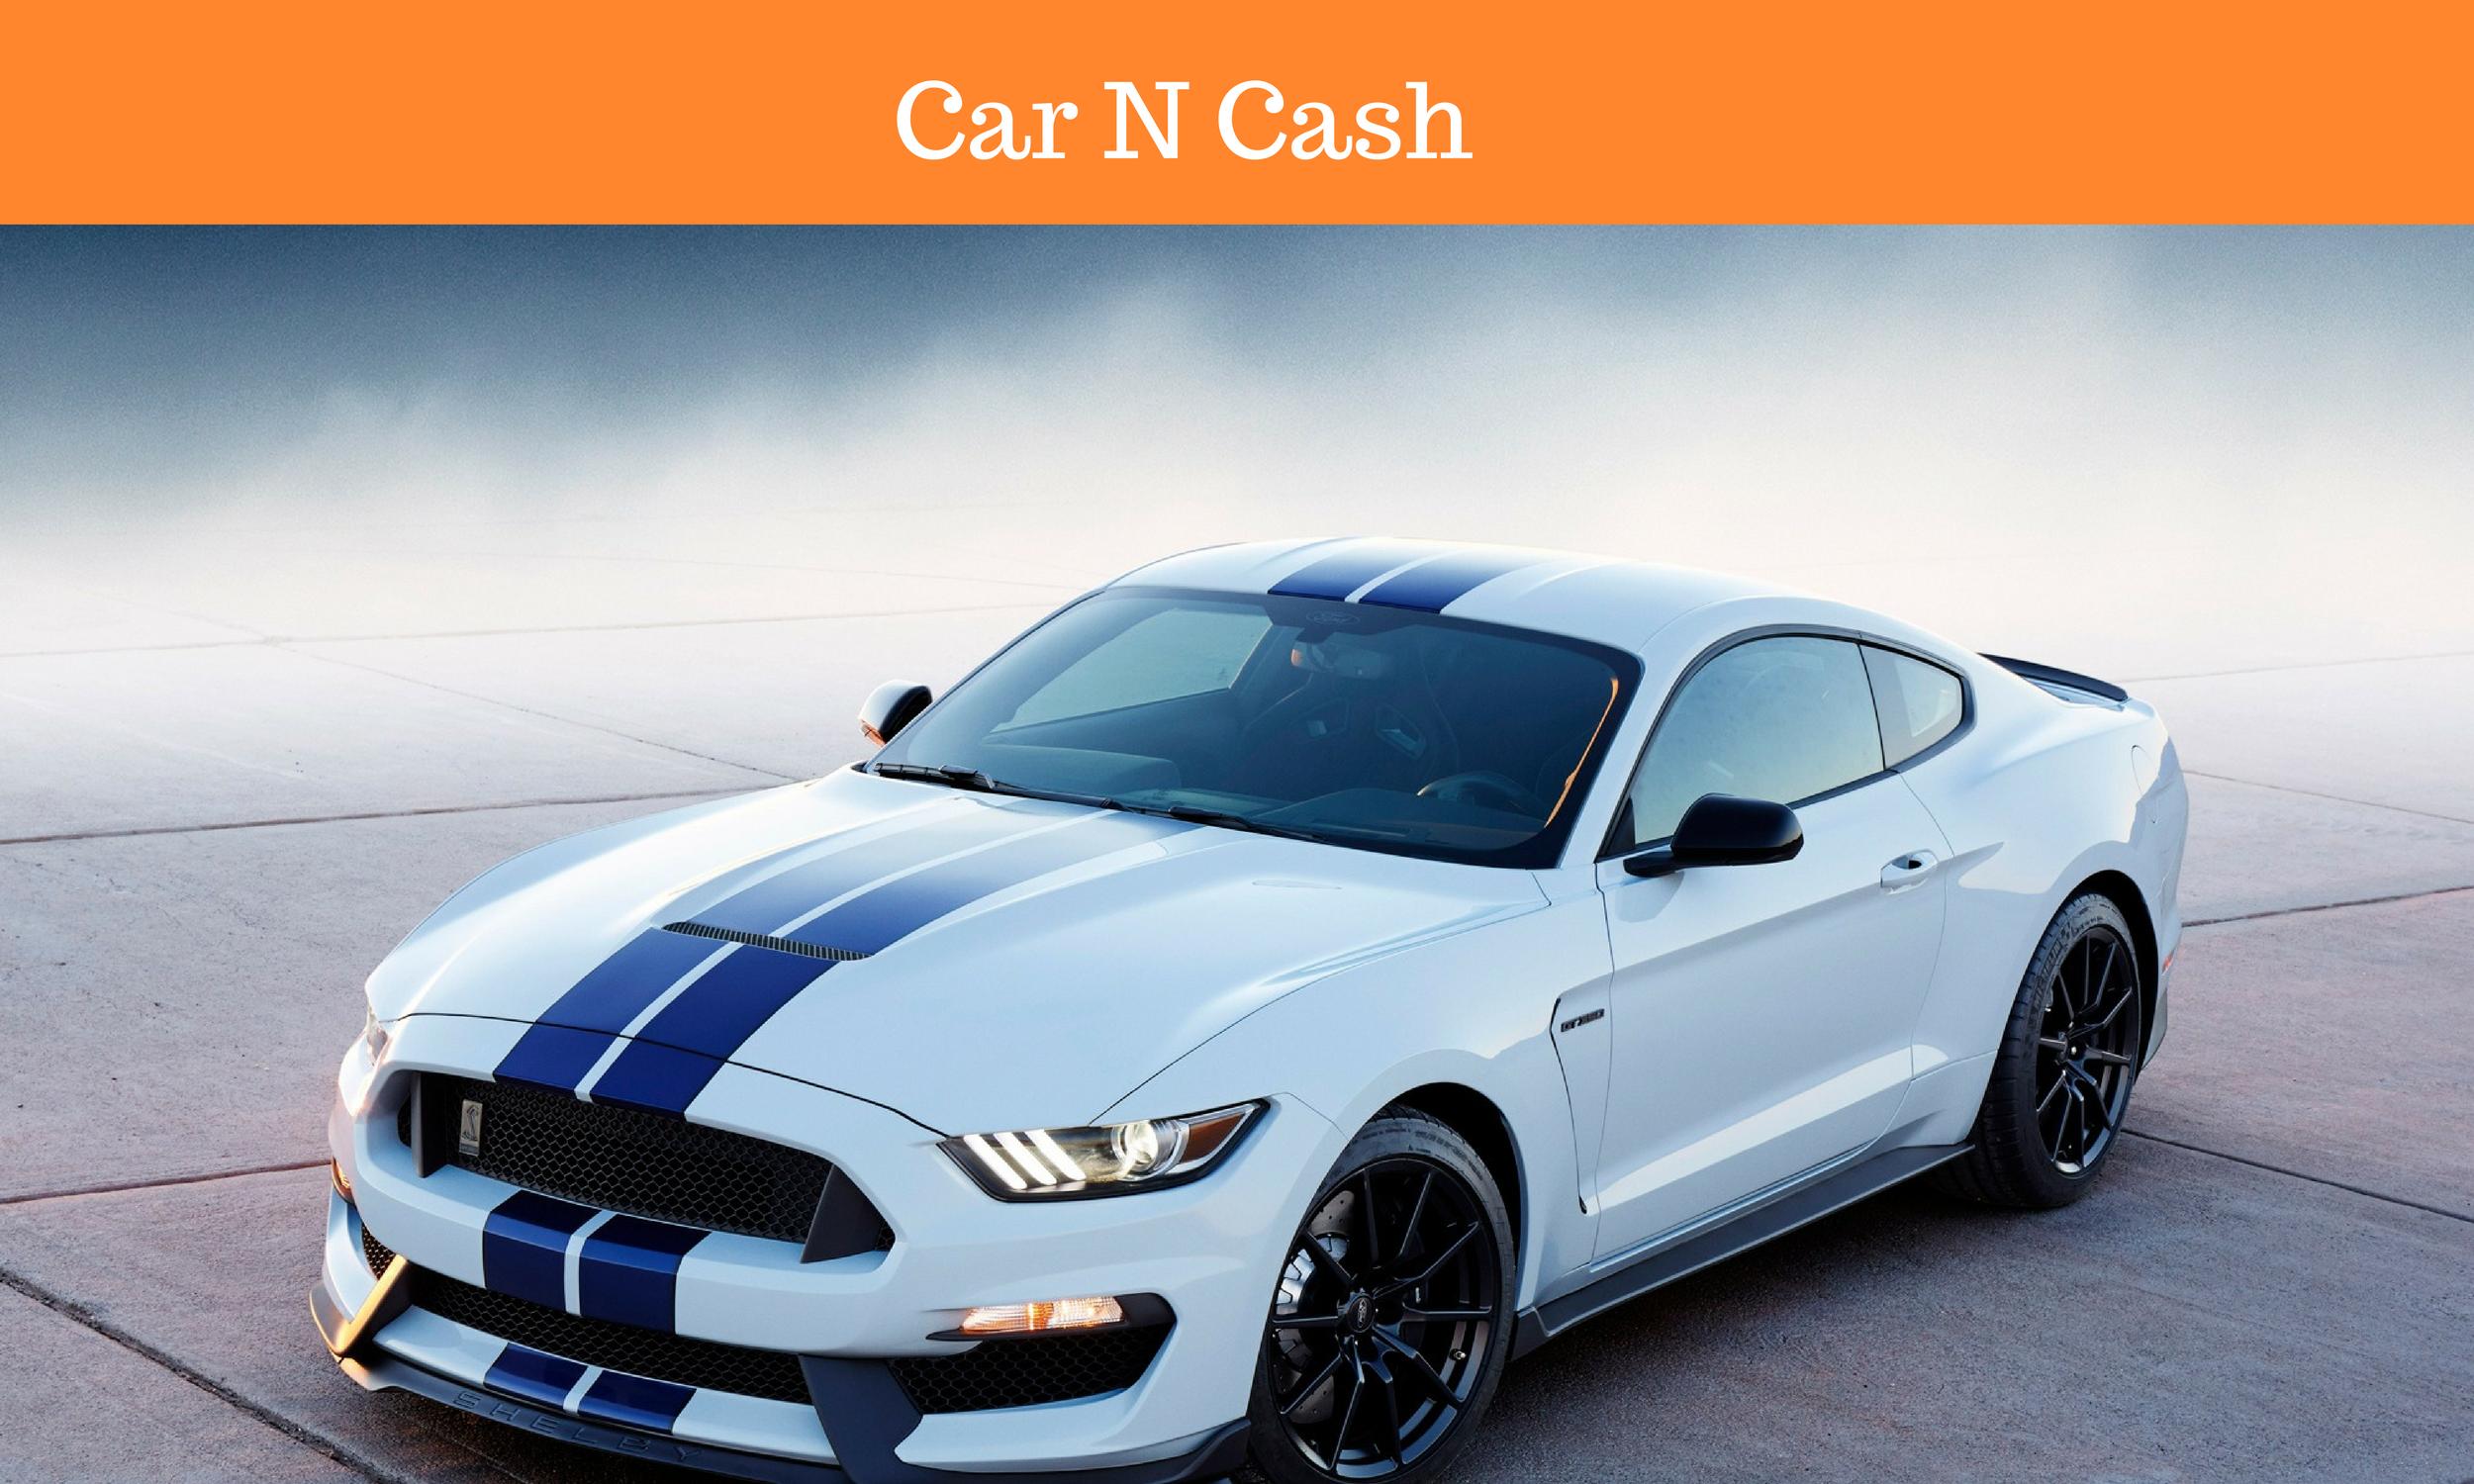 Car N Cash